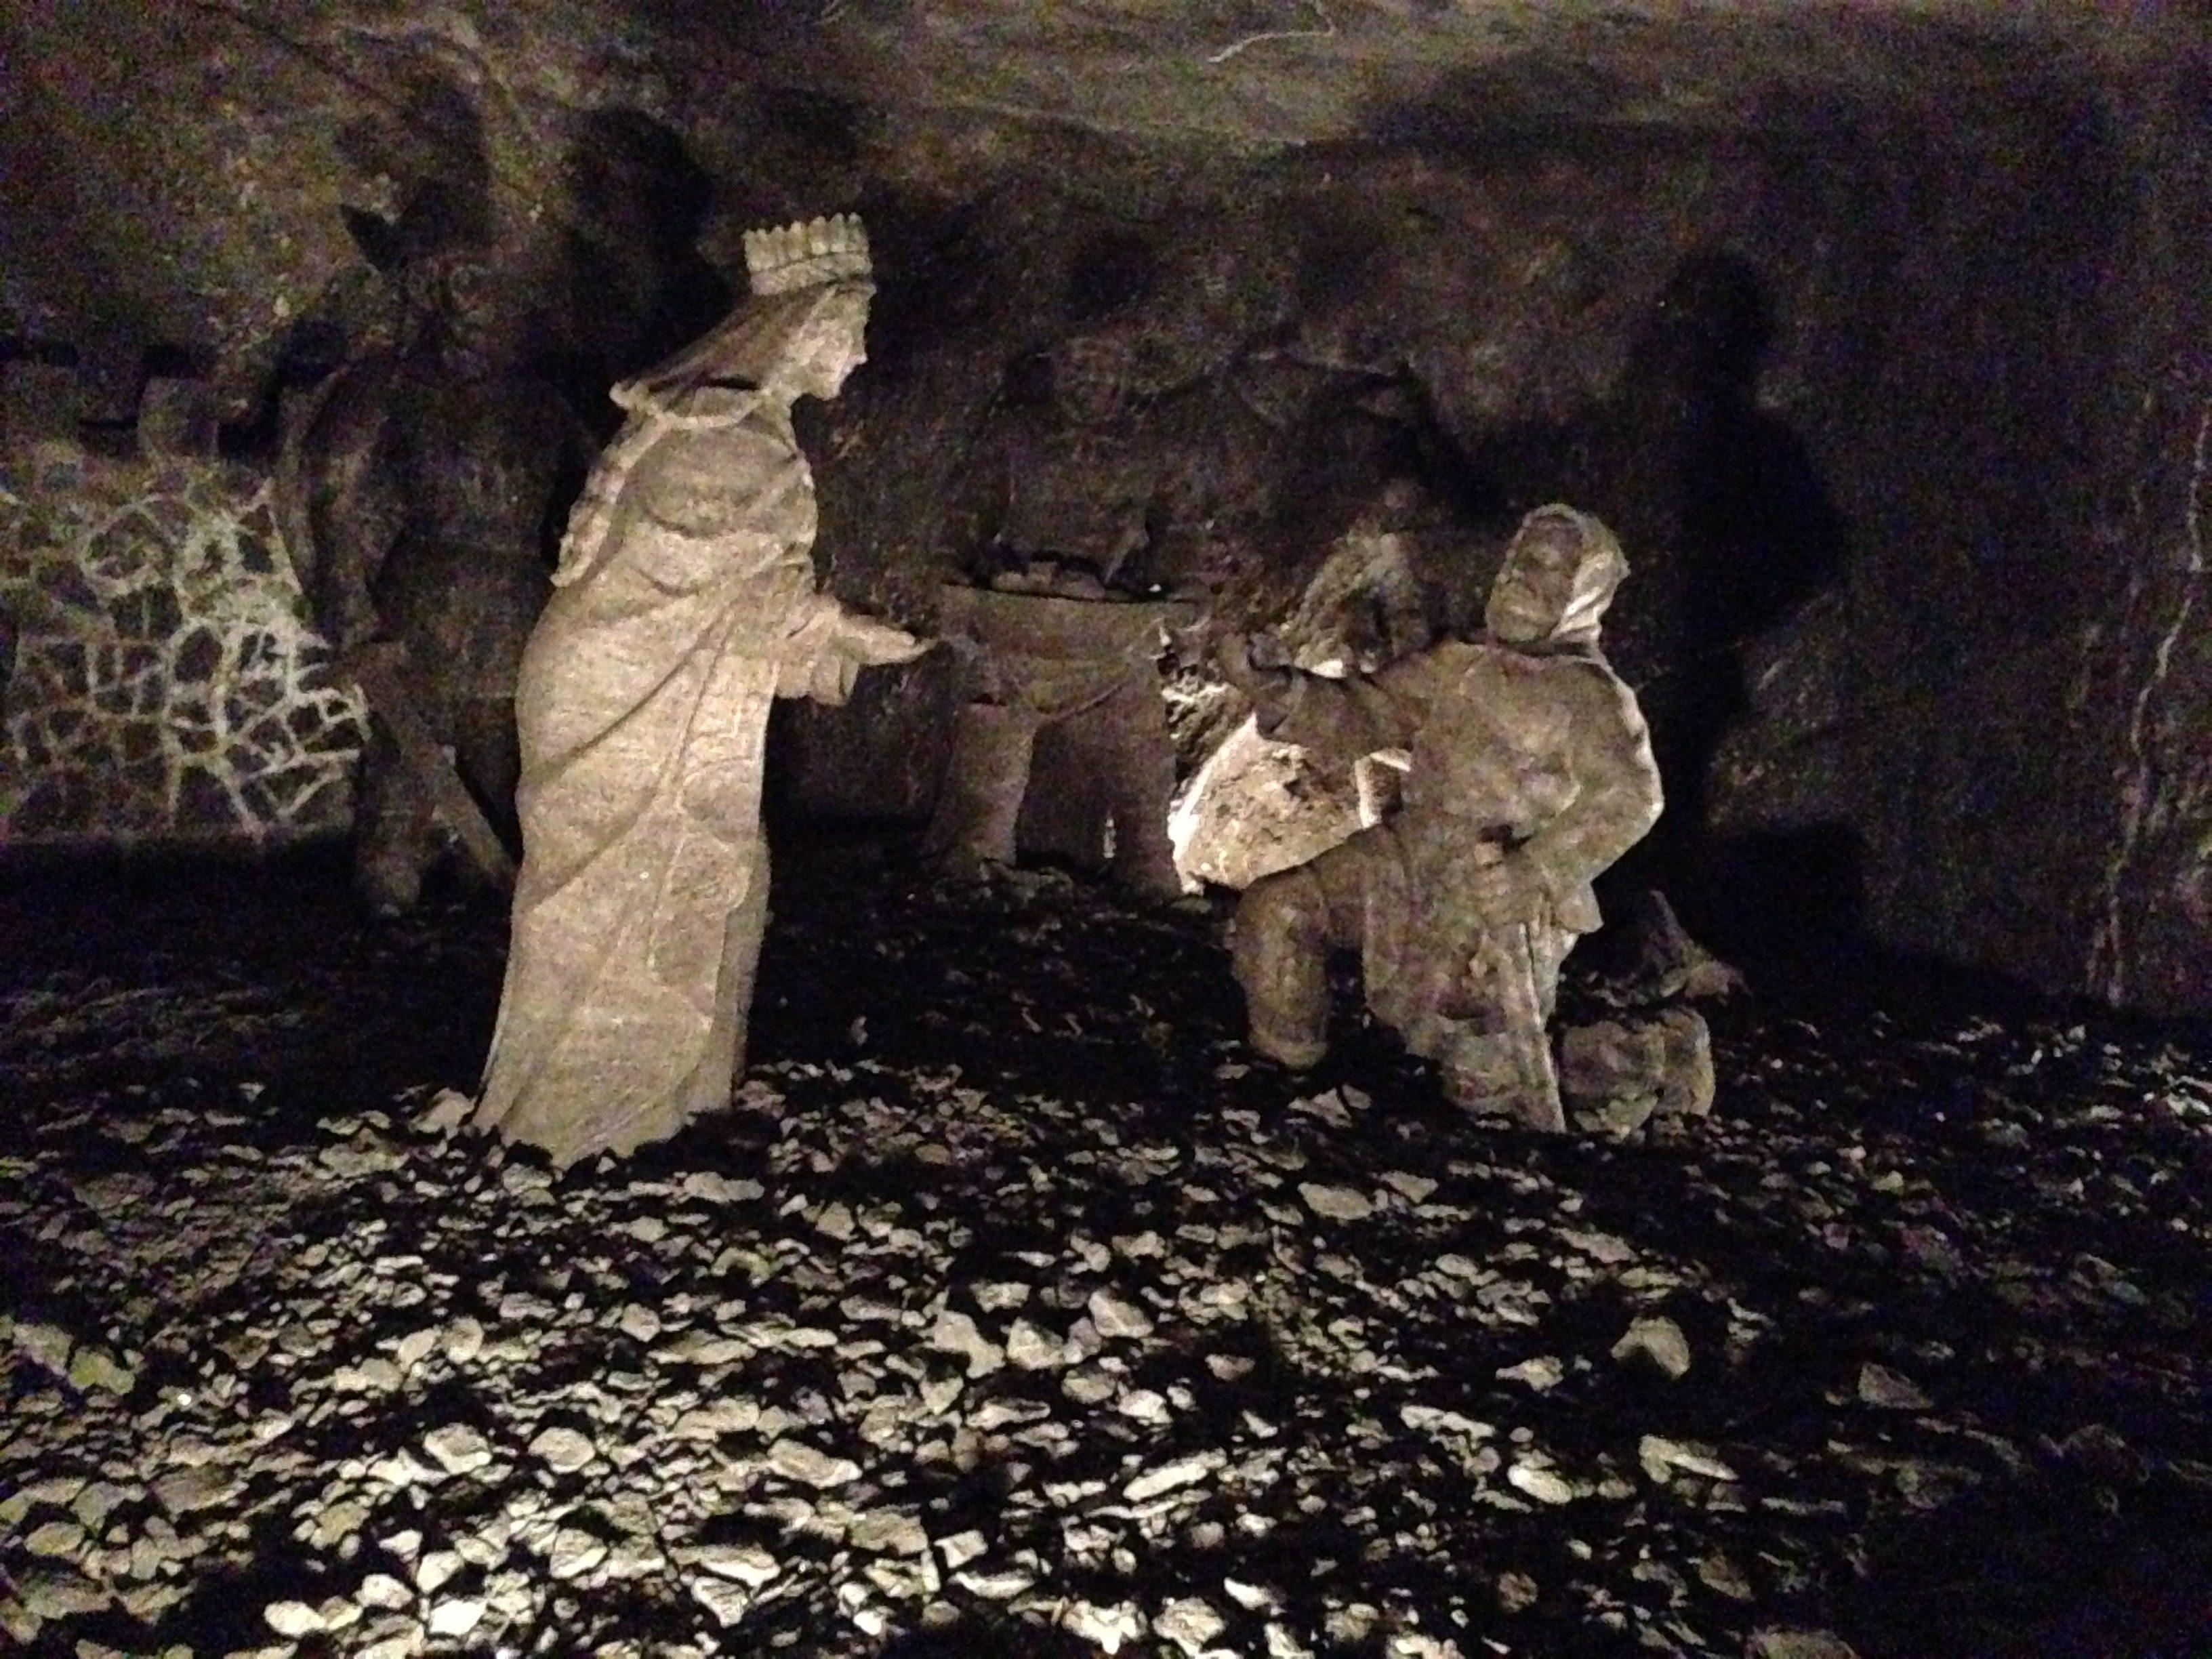 The miners returning the ring to Princess Kinga